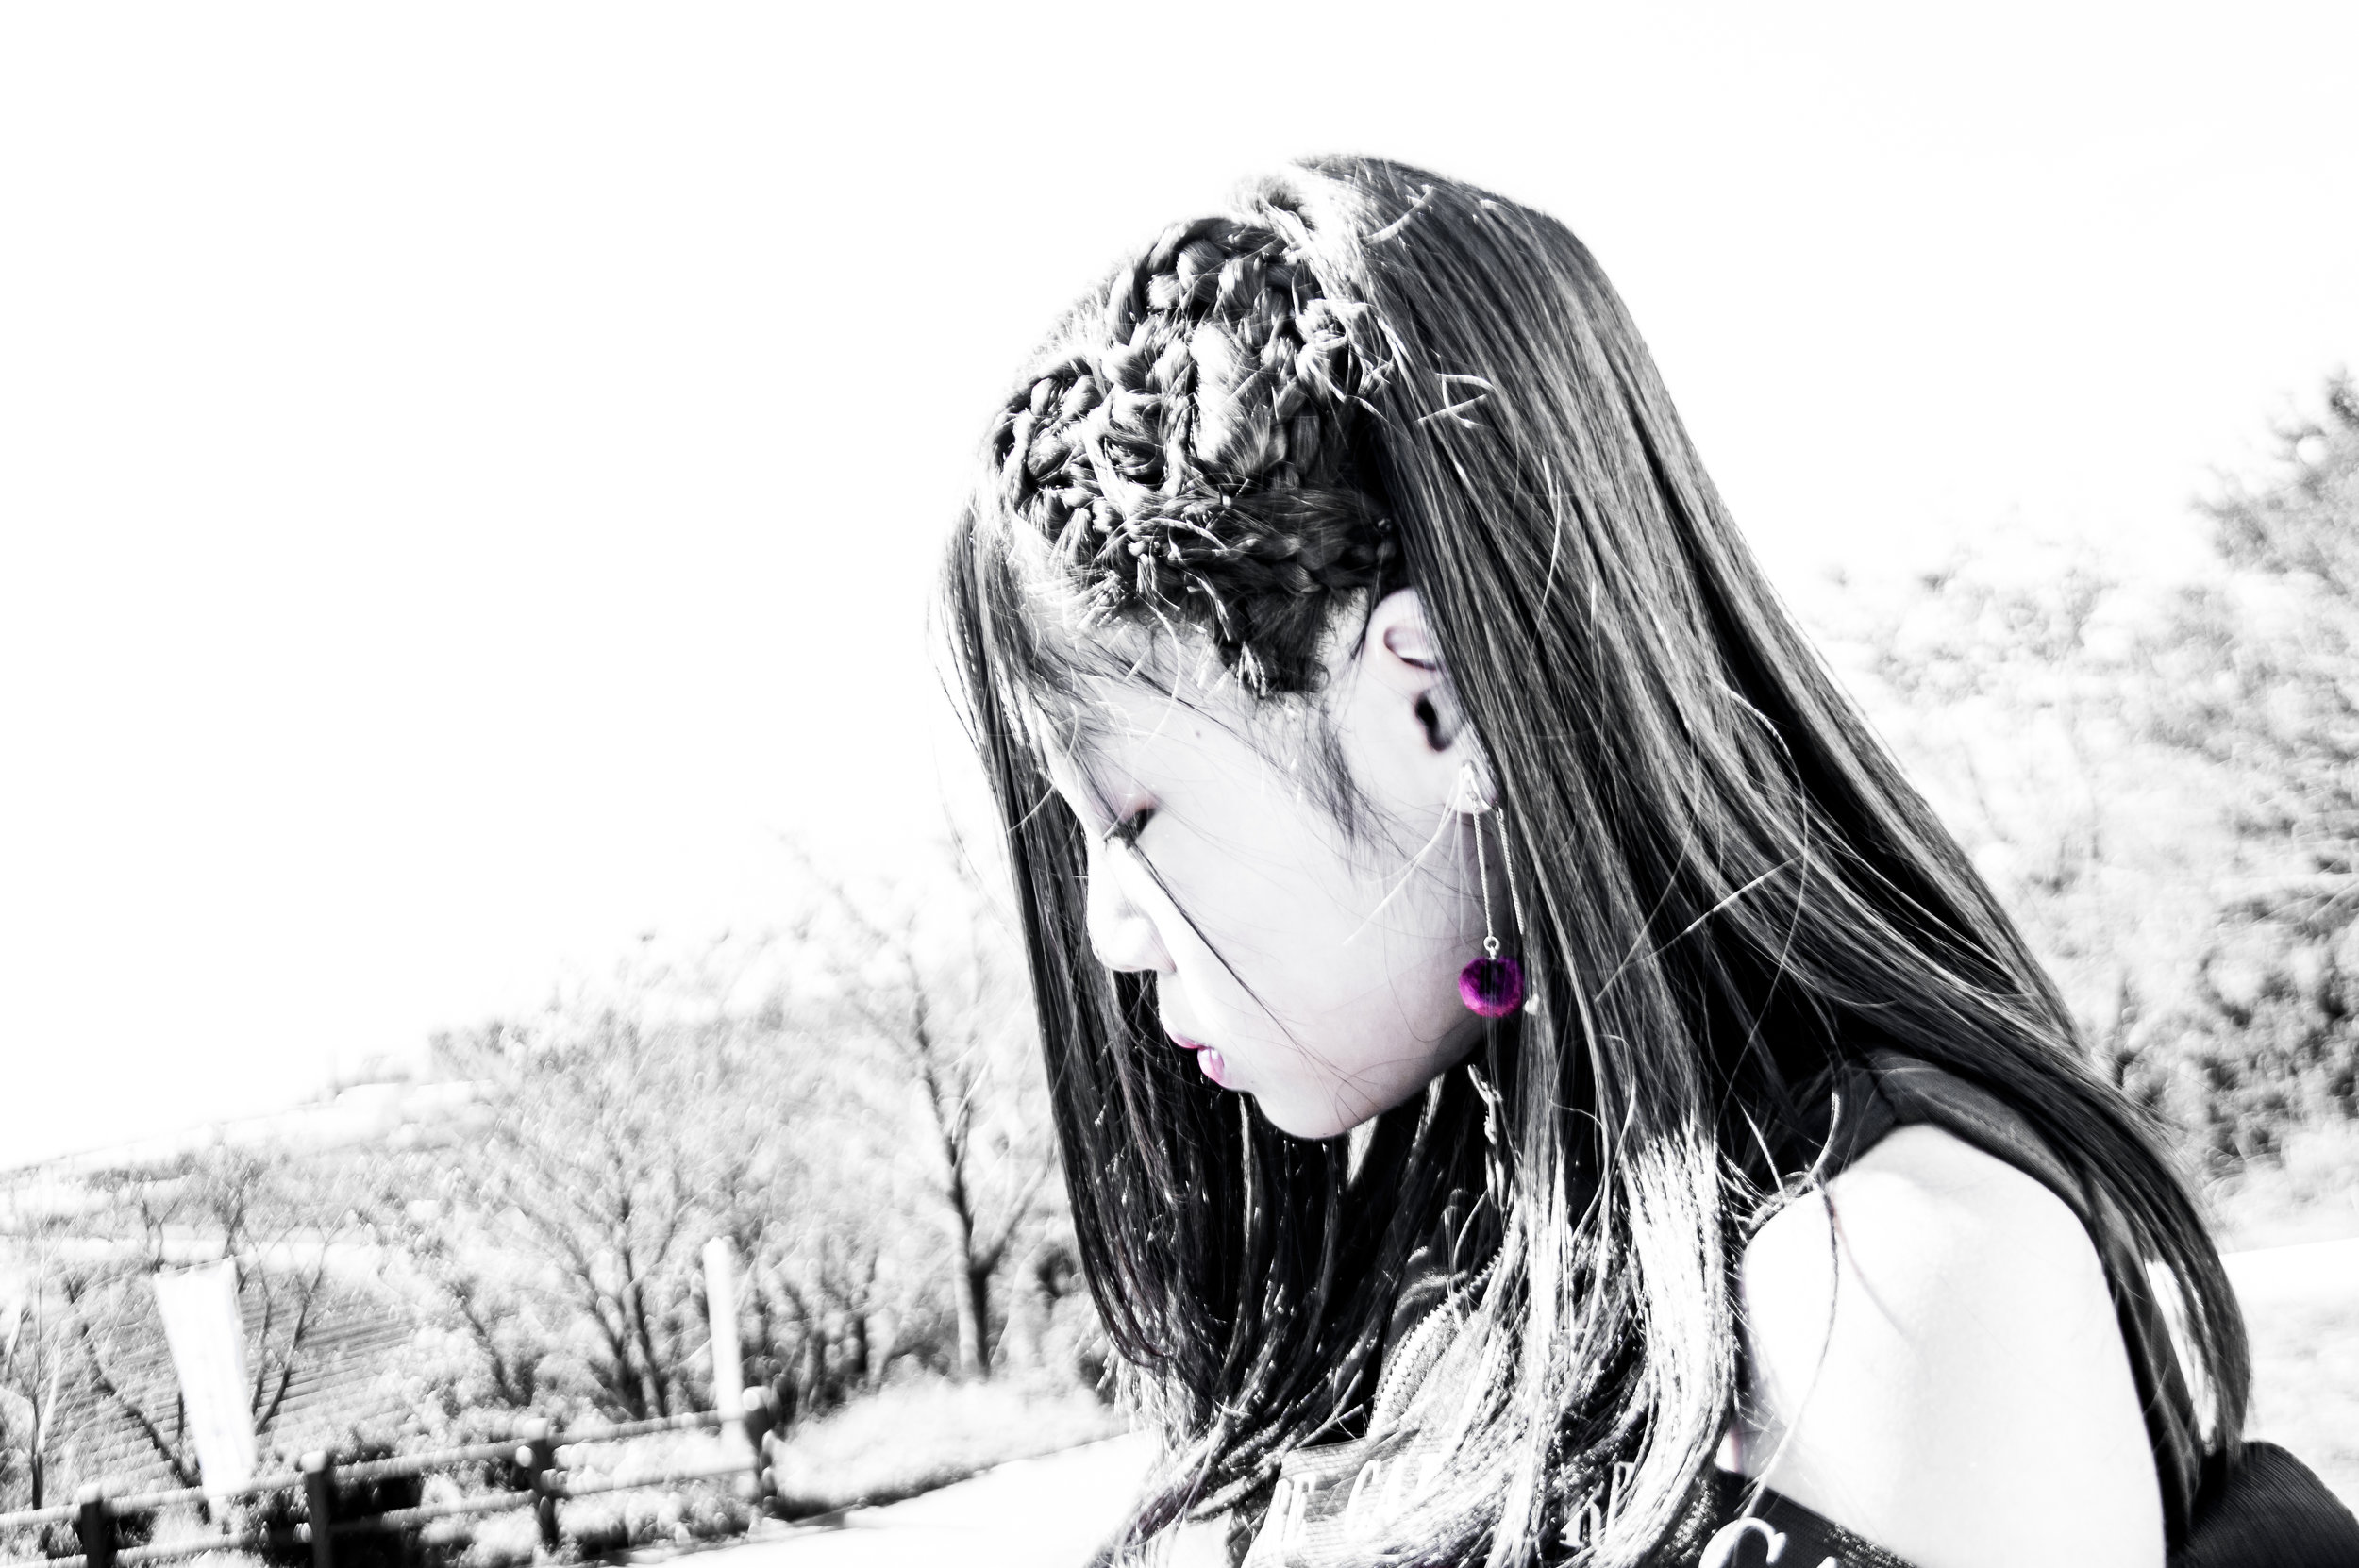 DSC_1843d.jpg